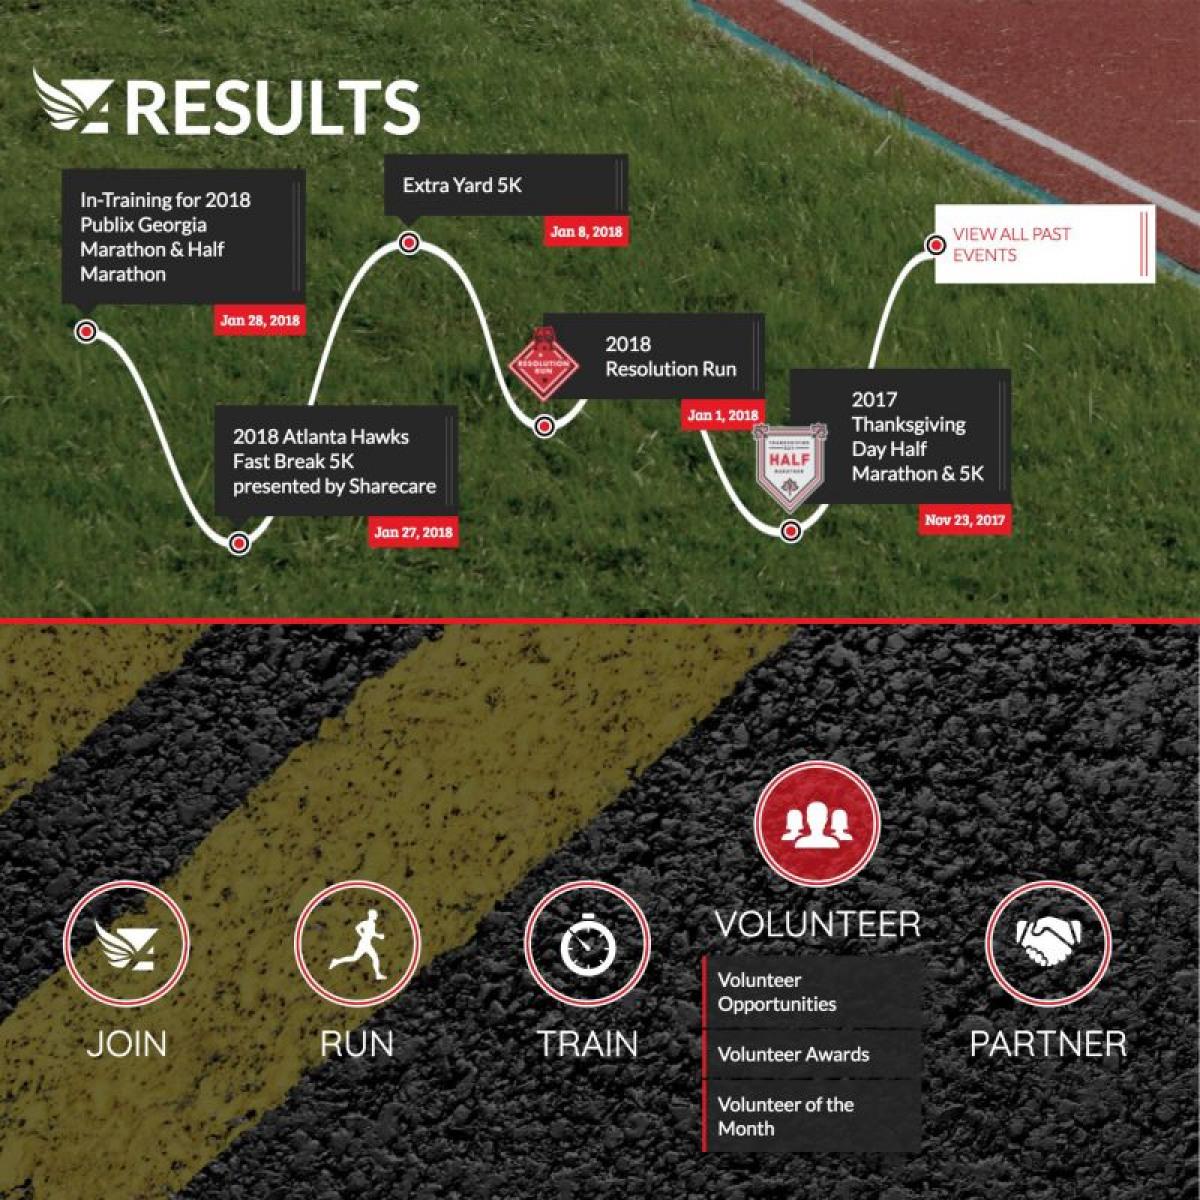 Image of website for Atlanta Track Club